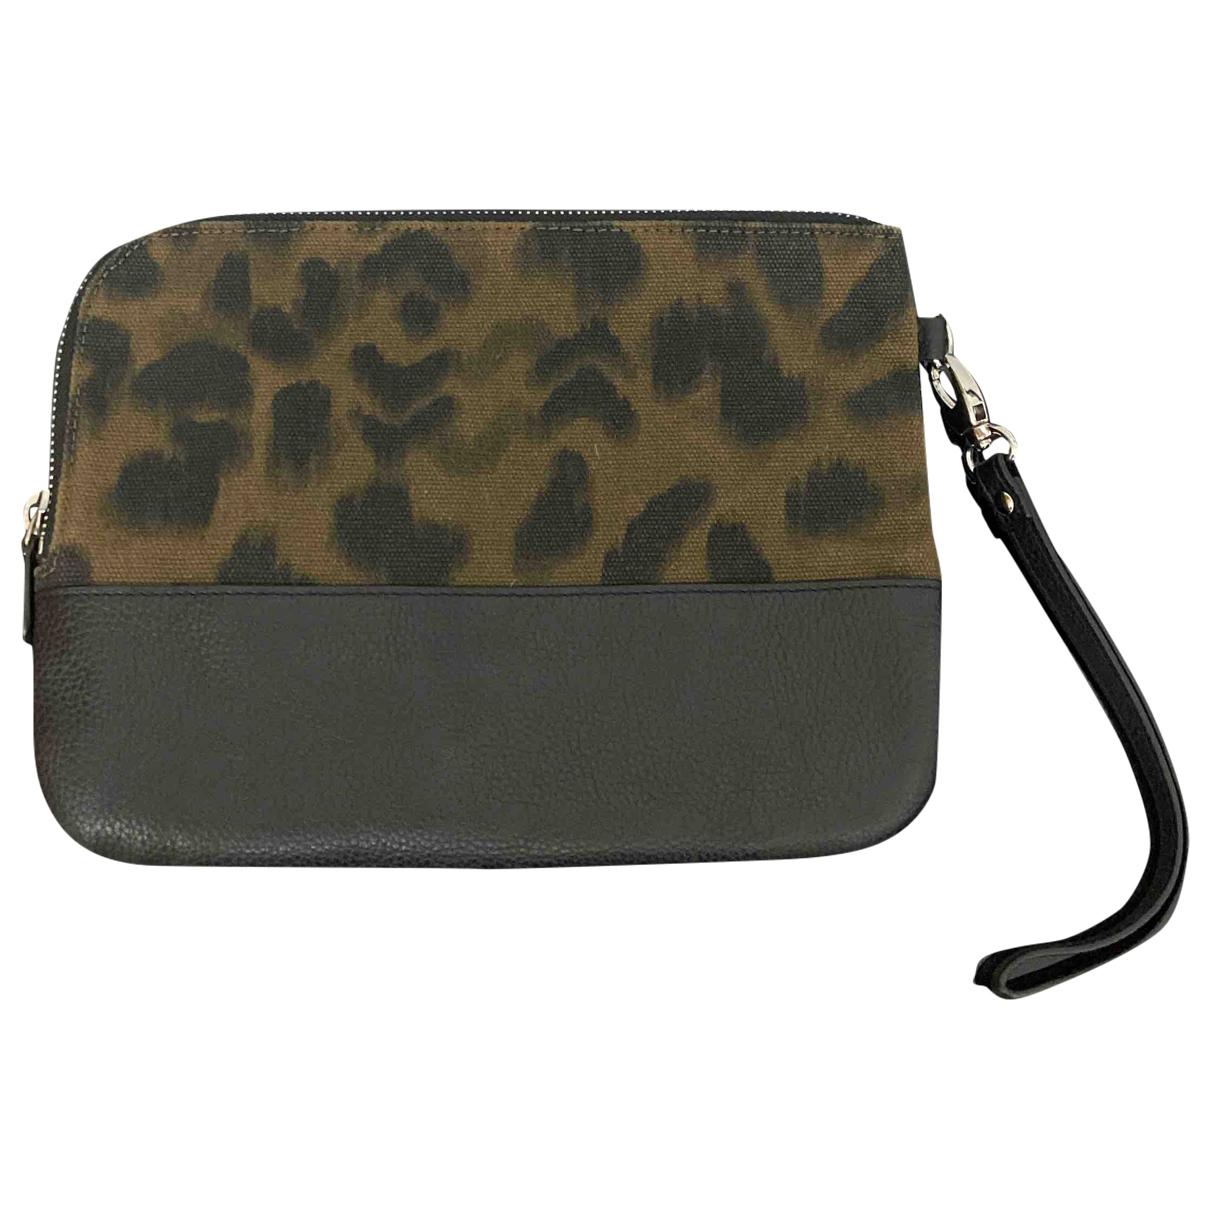 Sandro \N Green Cotton Clutch bag for Women \N